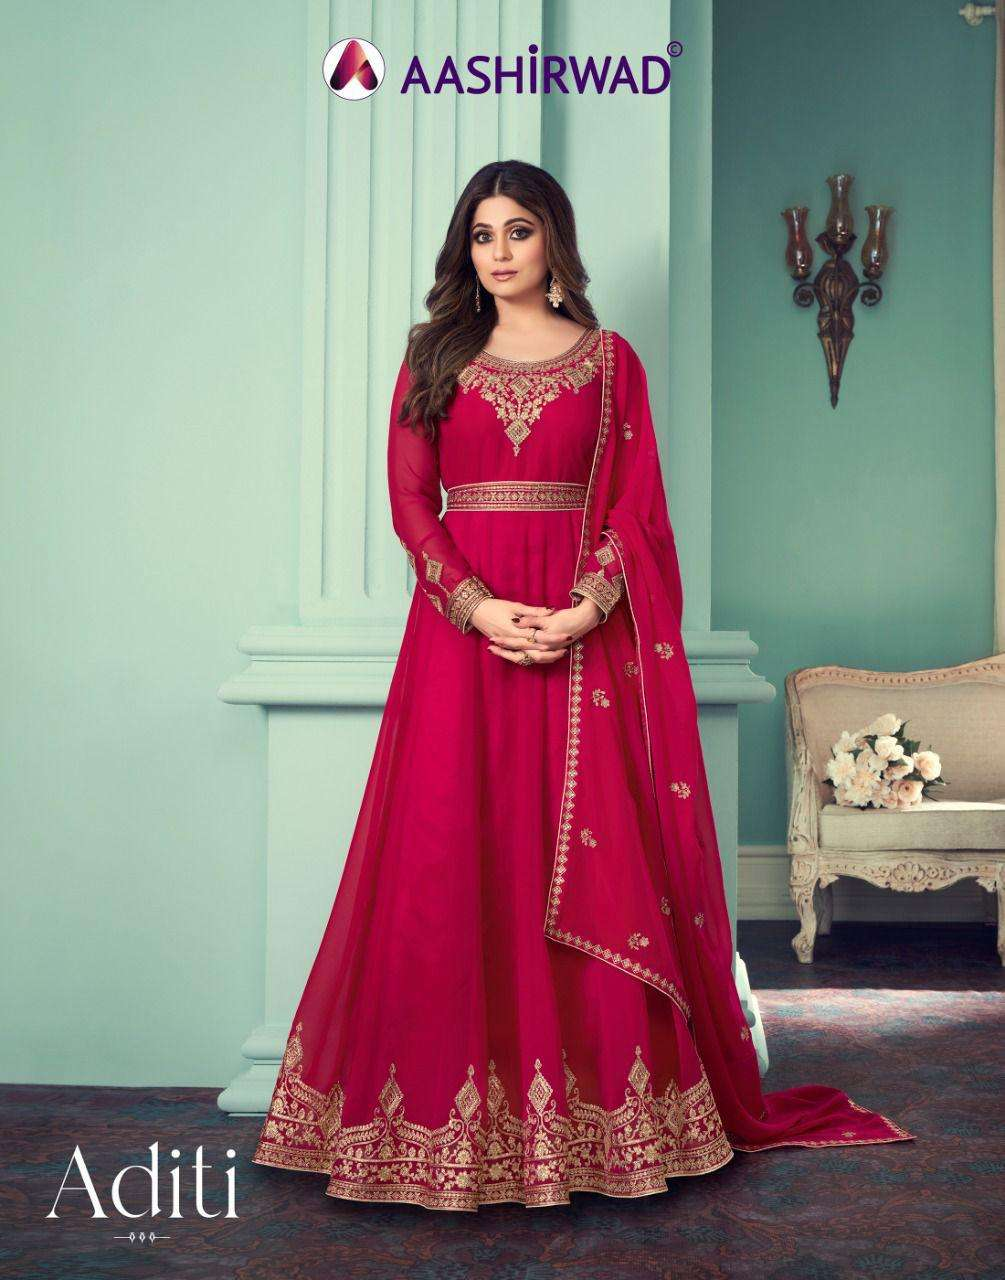 Ashirwad Aditi Designer Anarkali Party Wear Dress Catalog Supplier in Surat